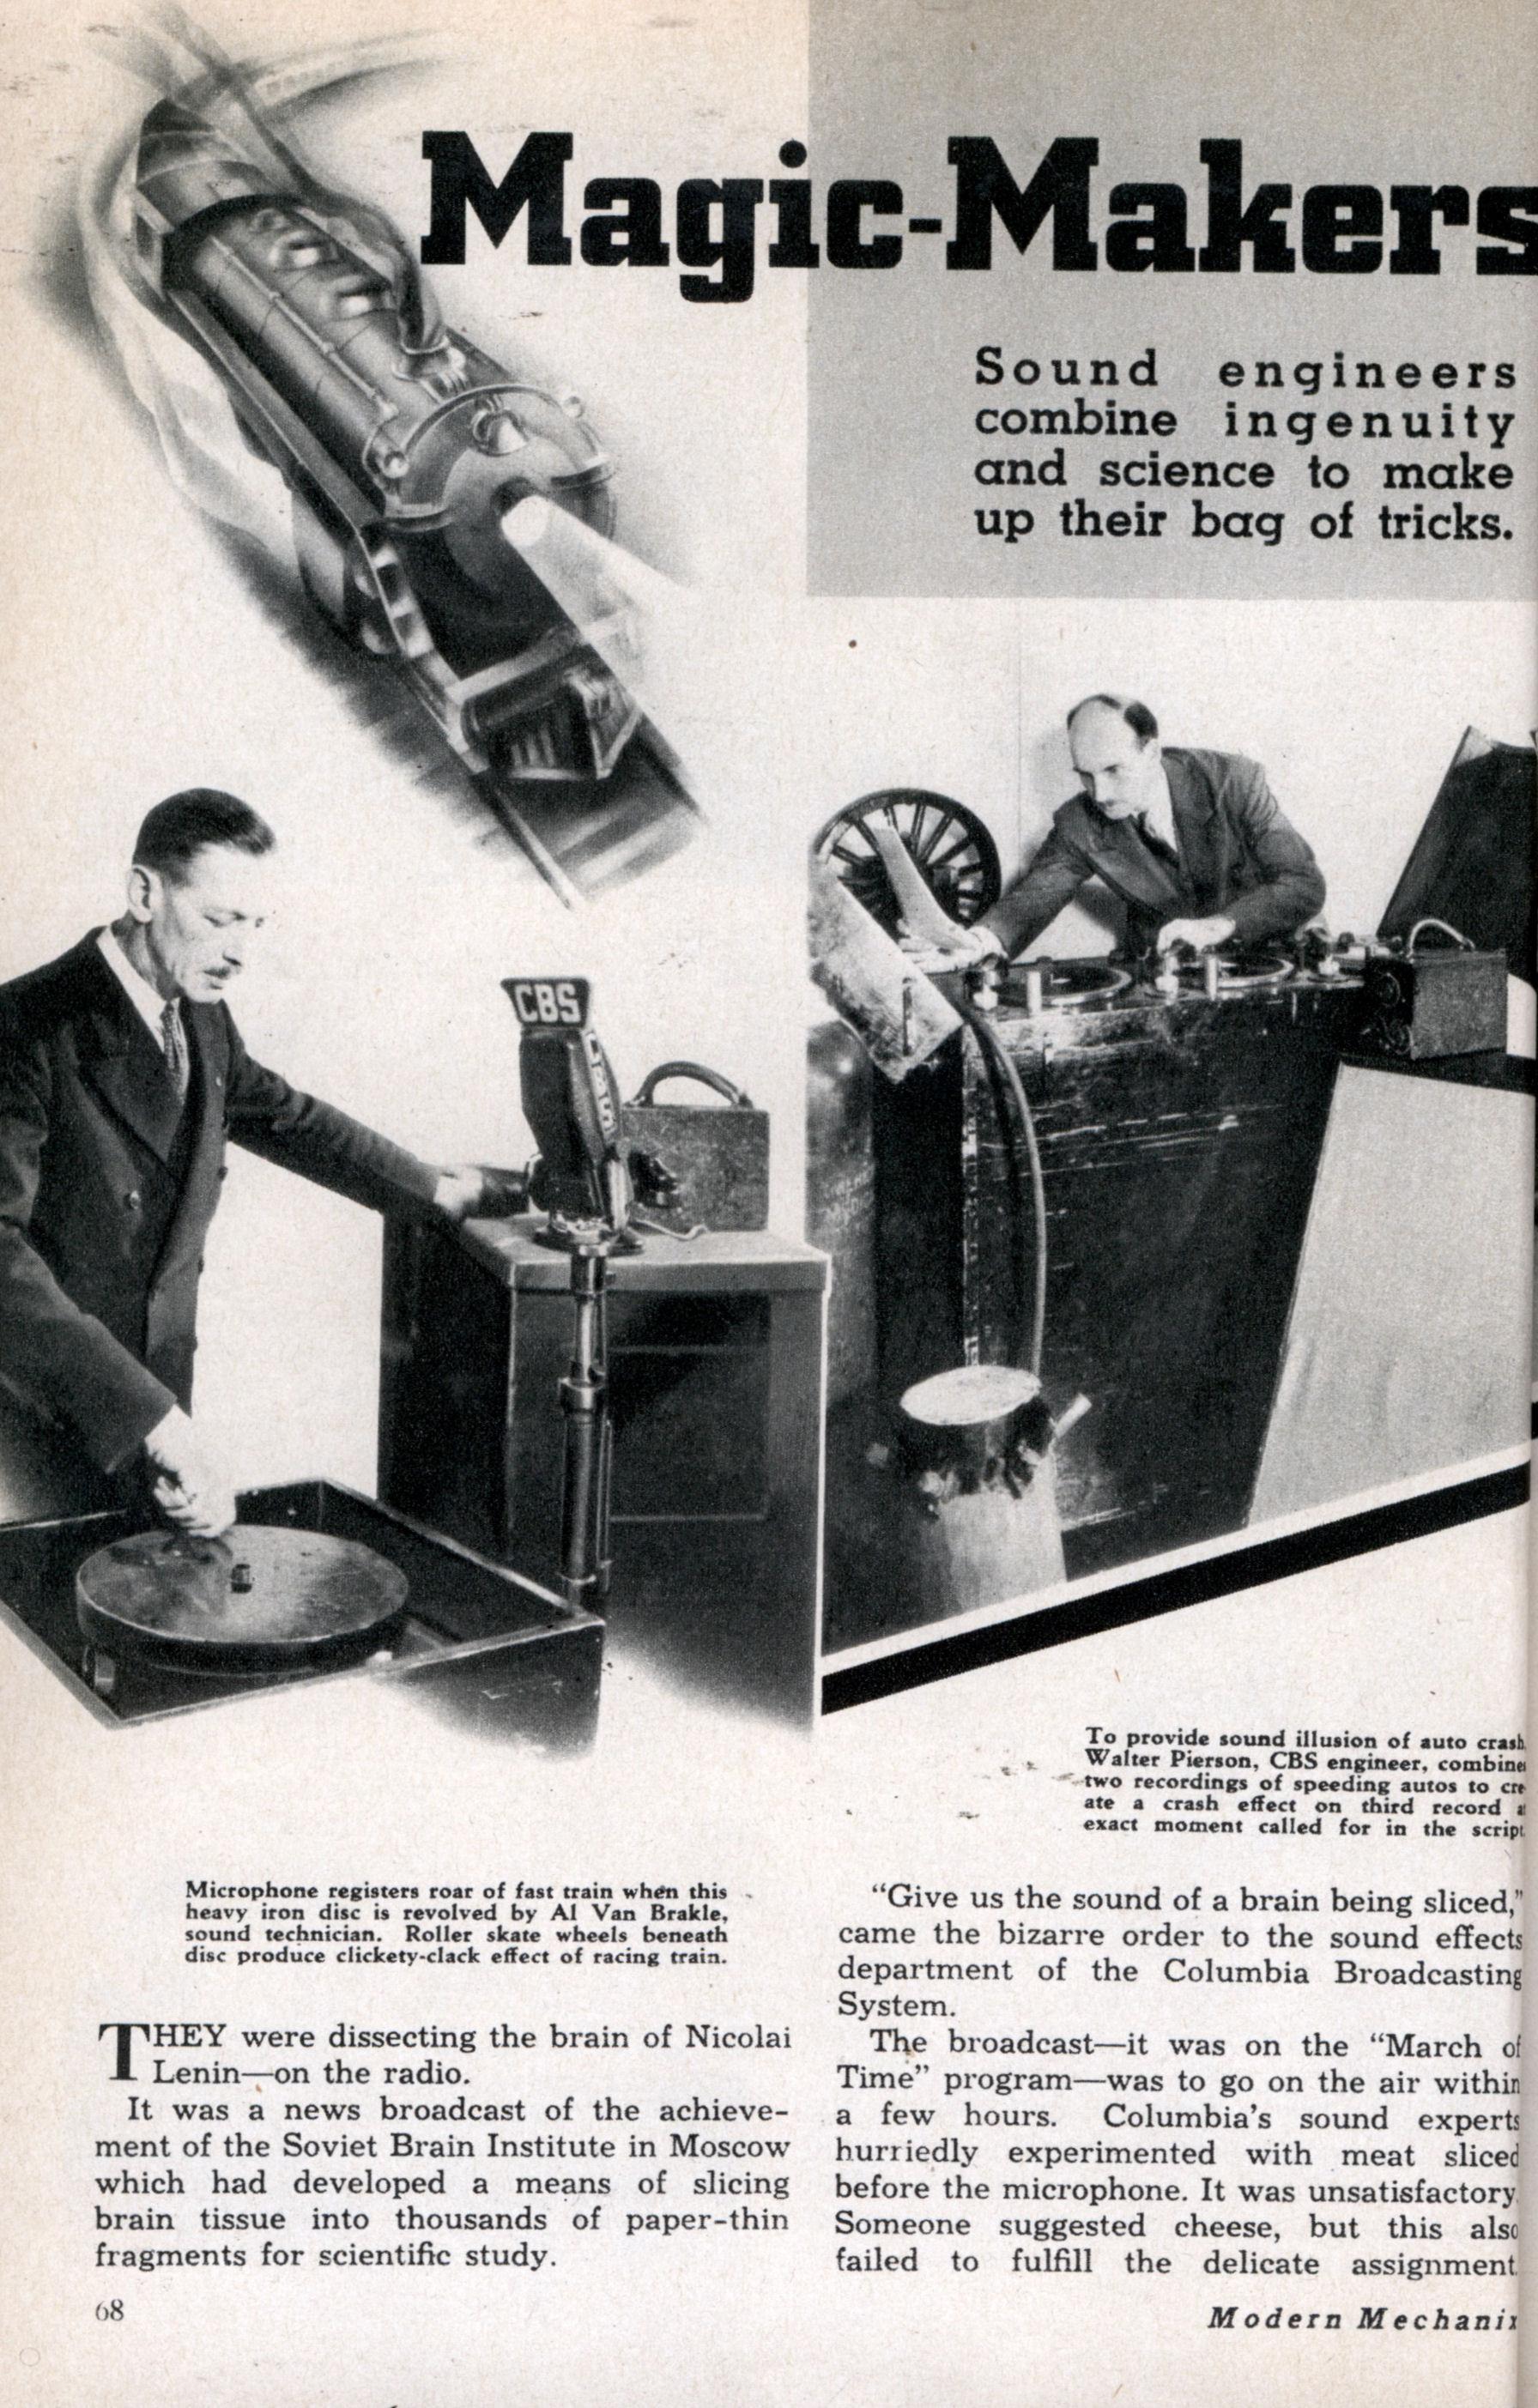 Magic-Makers of the Radio Stations | Modern Mechanix